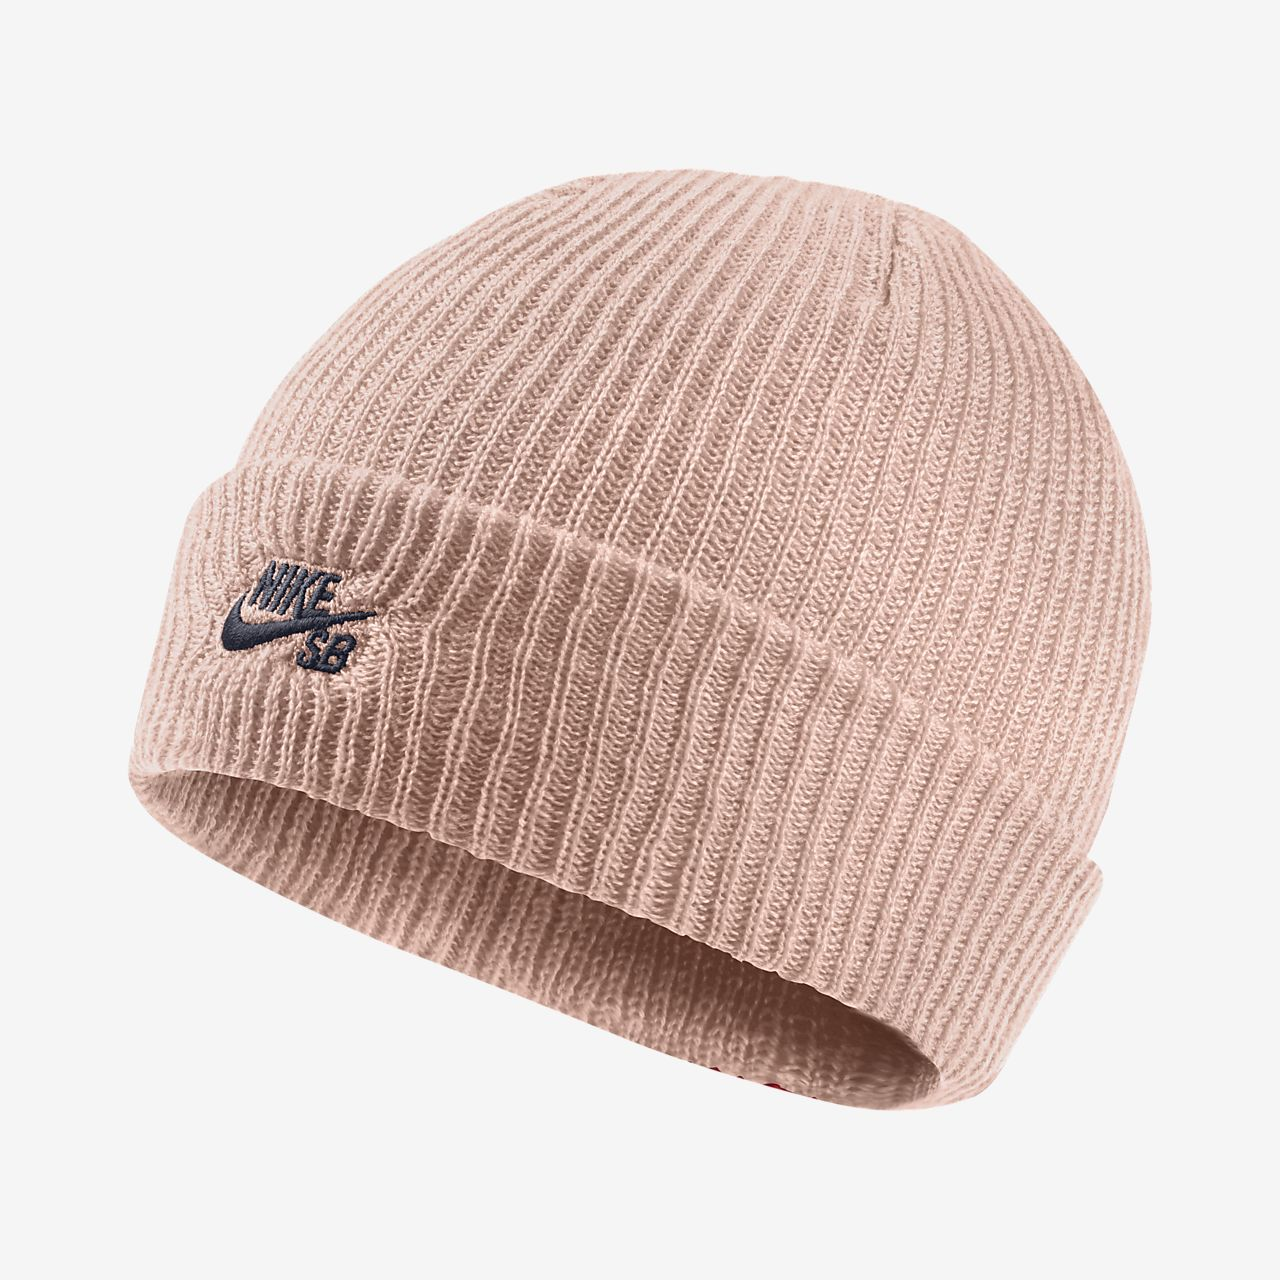 056950a00324 authentic nike sb fisherman knit hat free 2000c 948ad